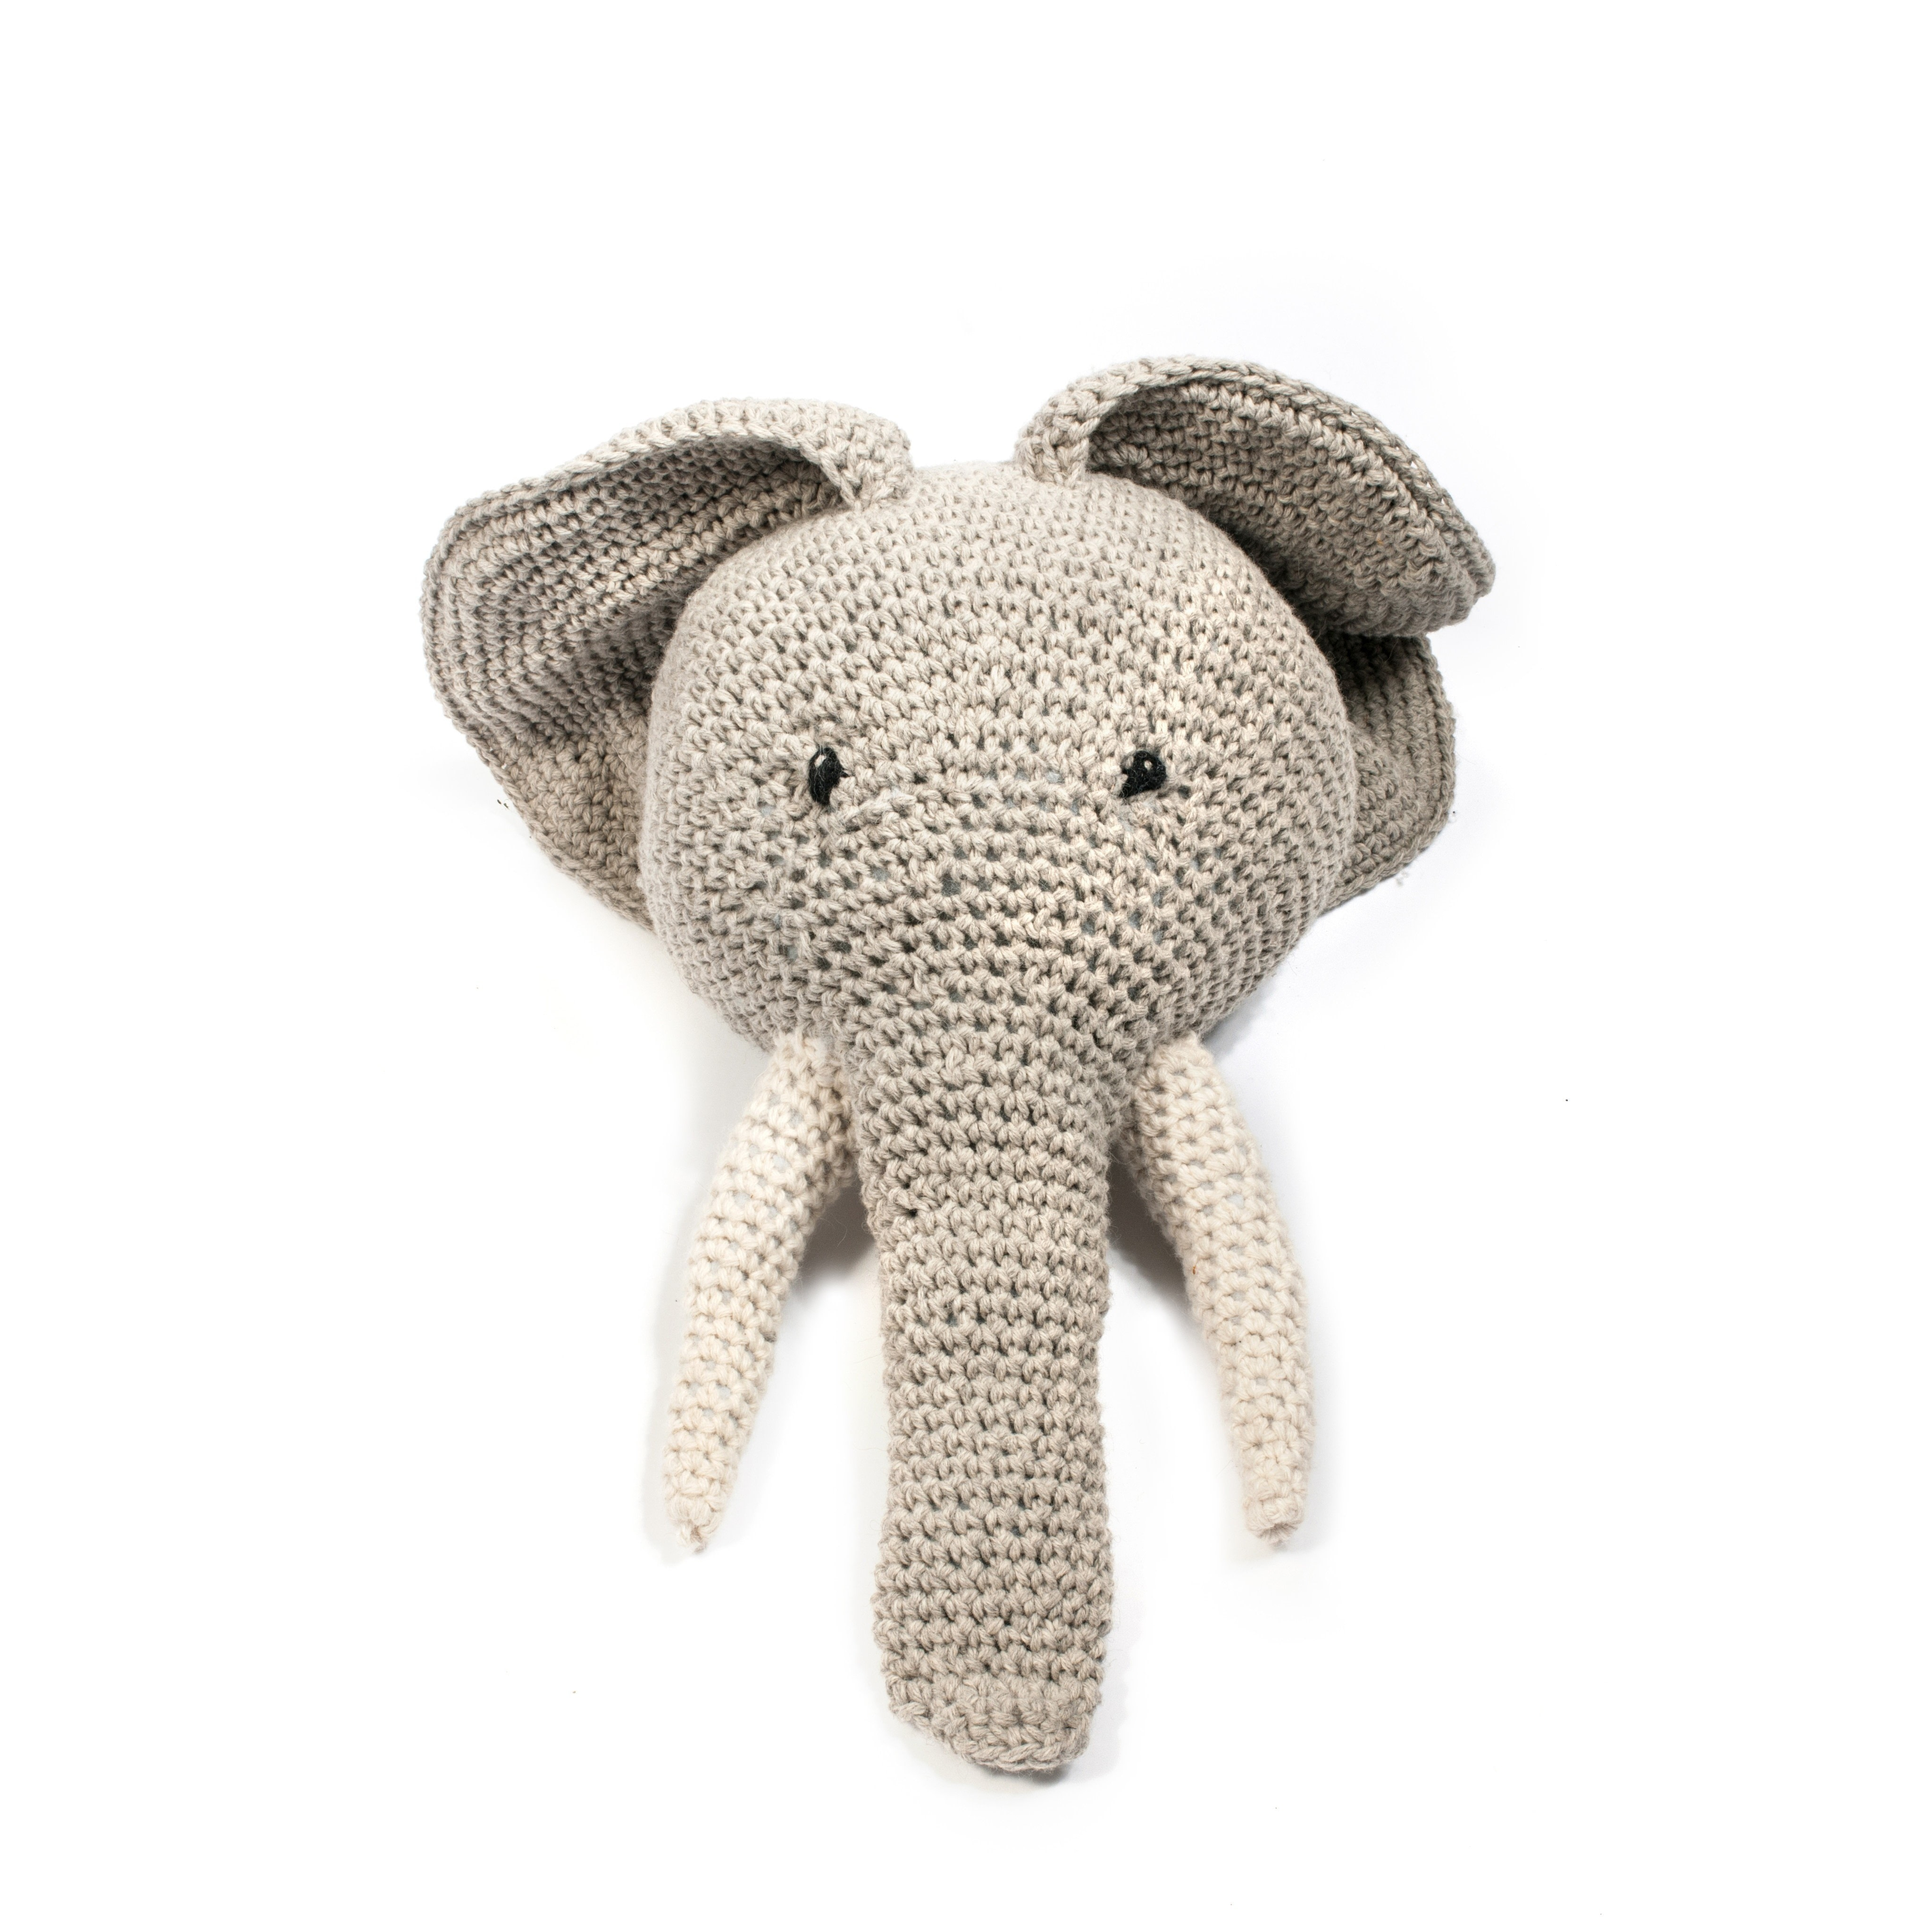 Giant Elephant Head How To Make A Taxidermy Mount